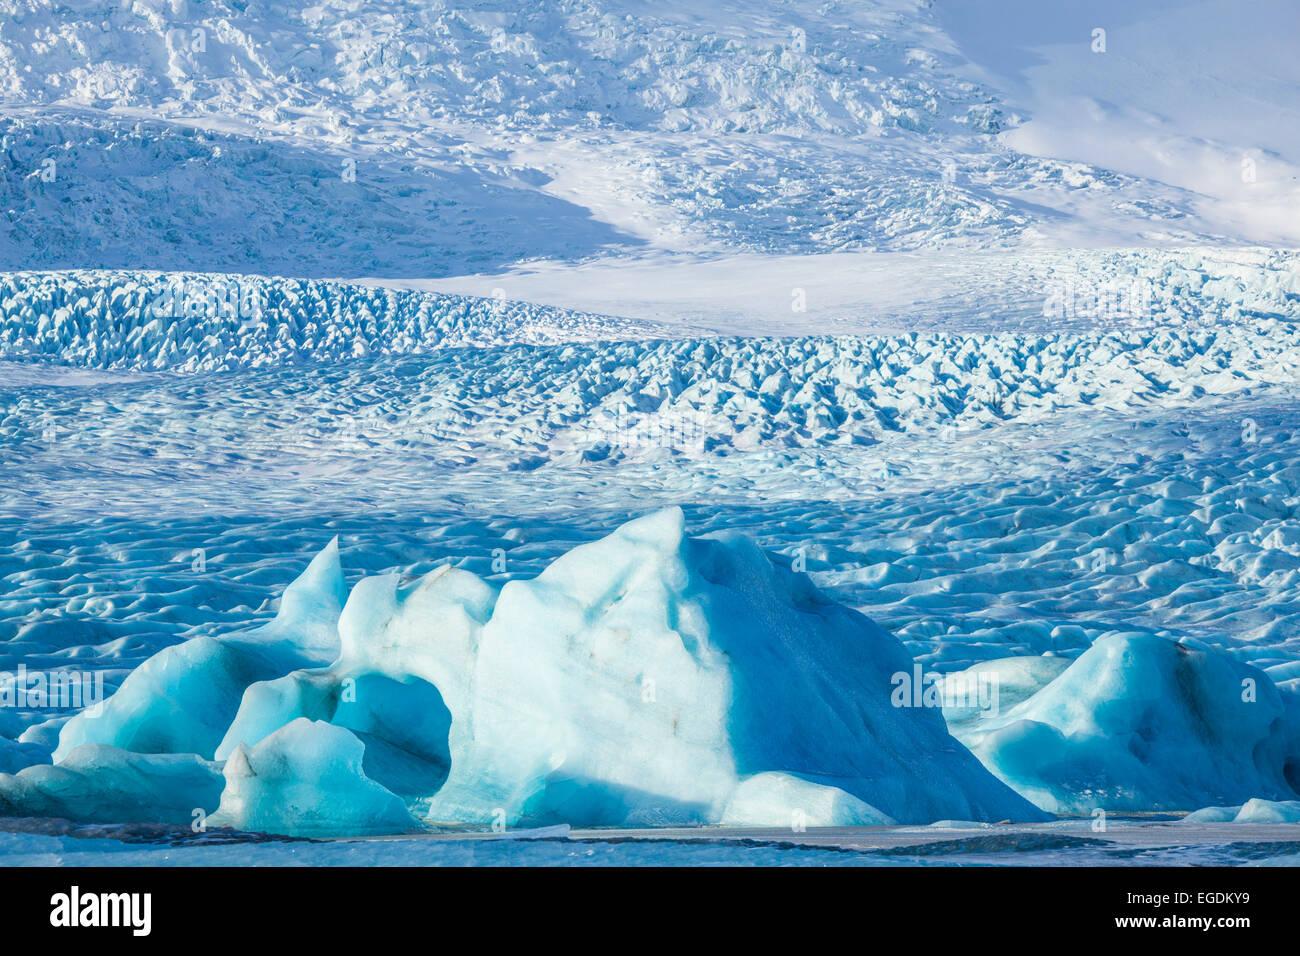 Fjallsarlon iceberg lagoon and Vatnajokull Glacier Iceland Europe - Stock Image